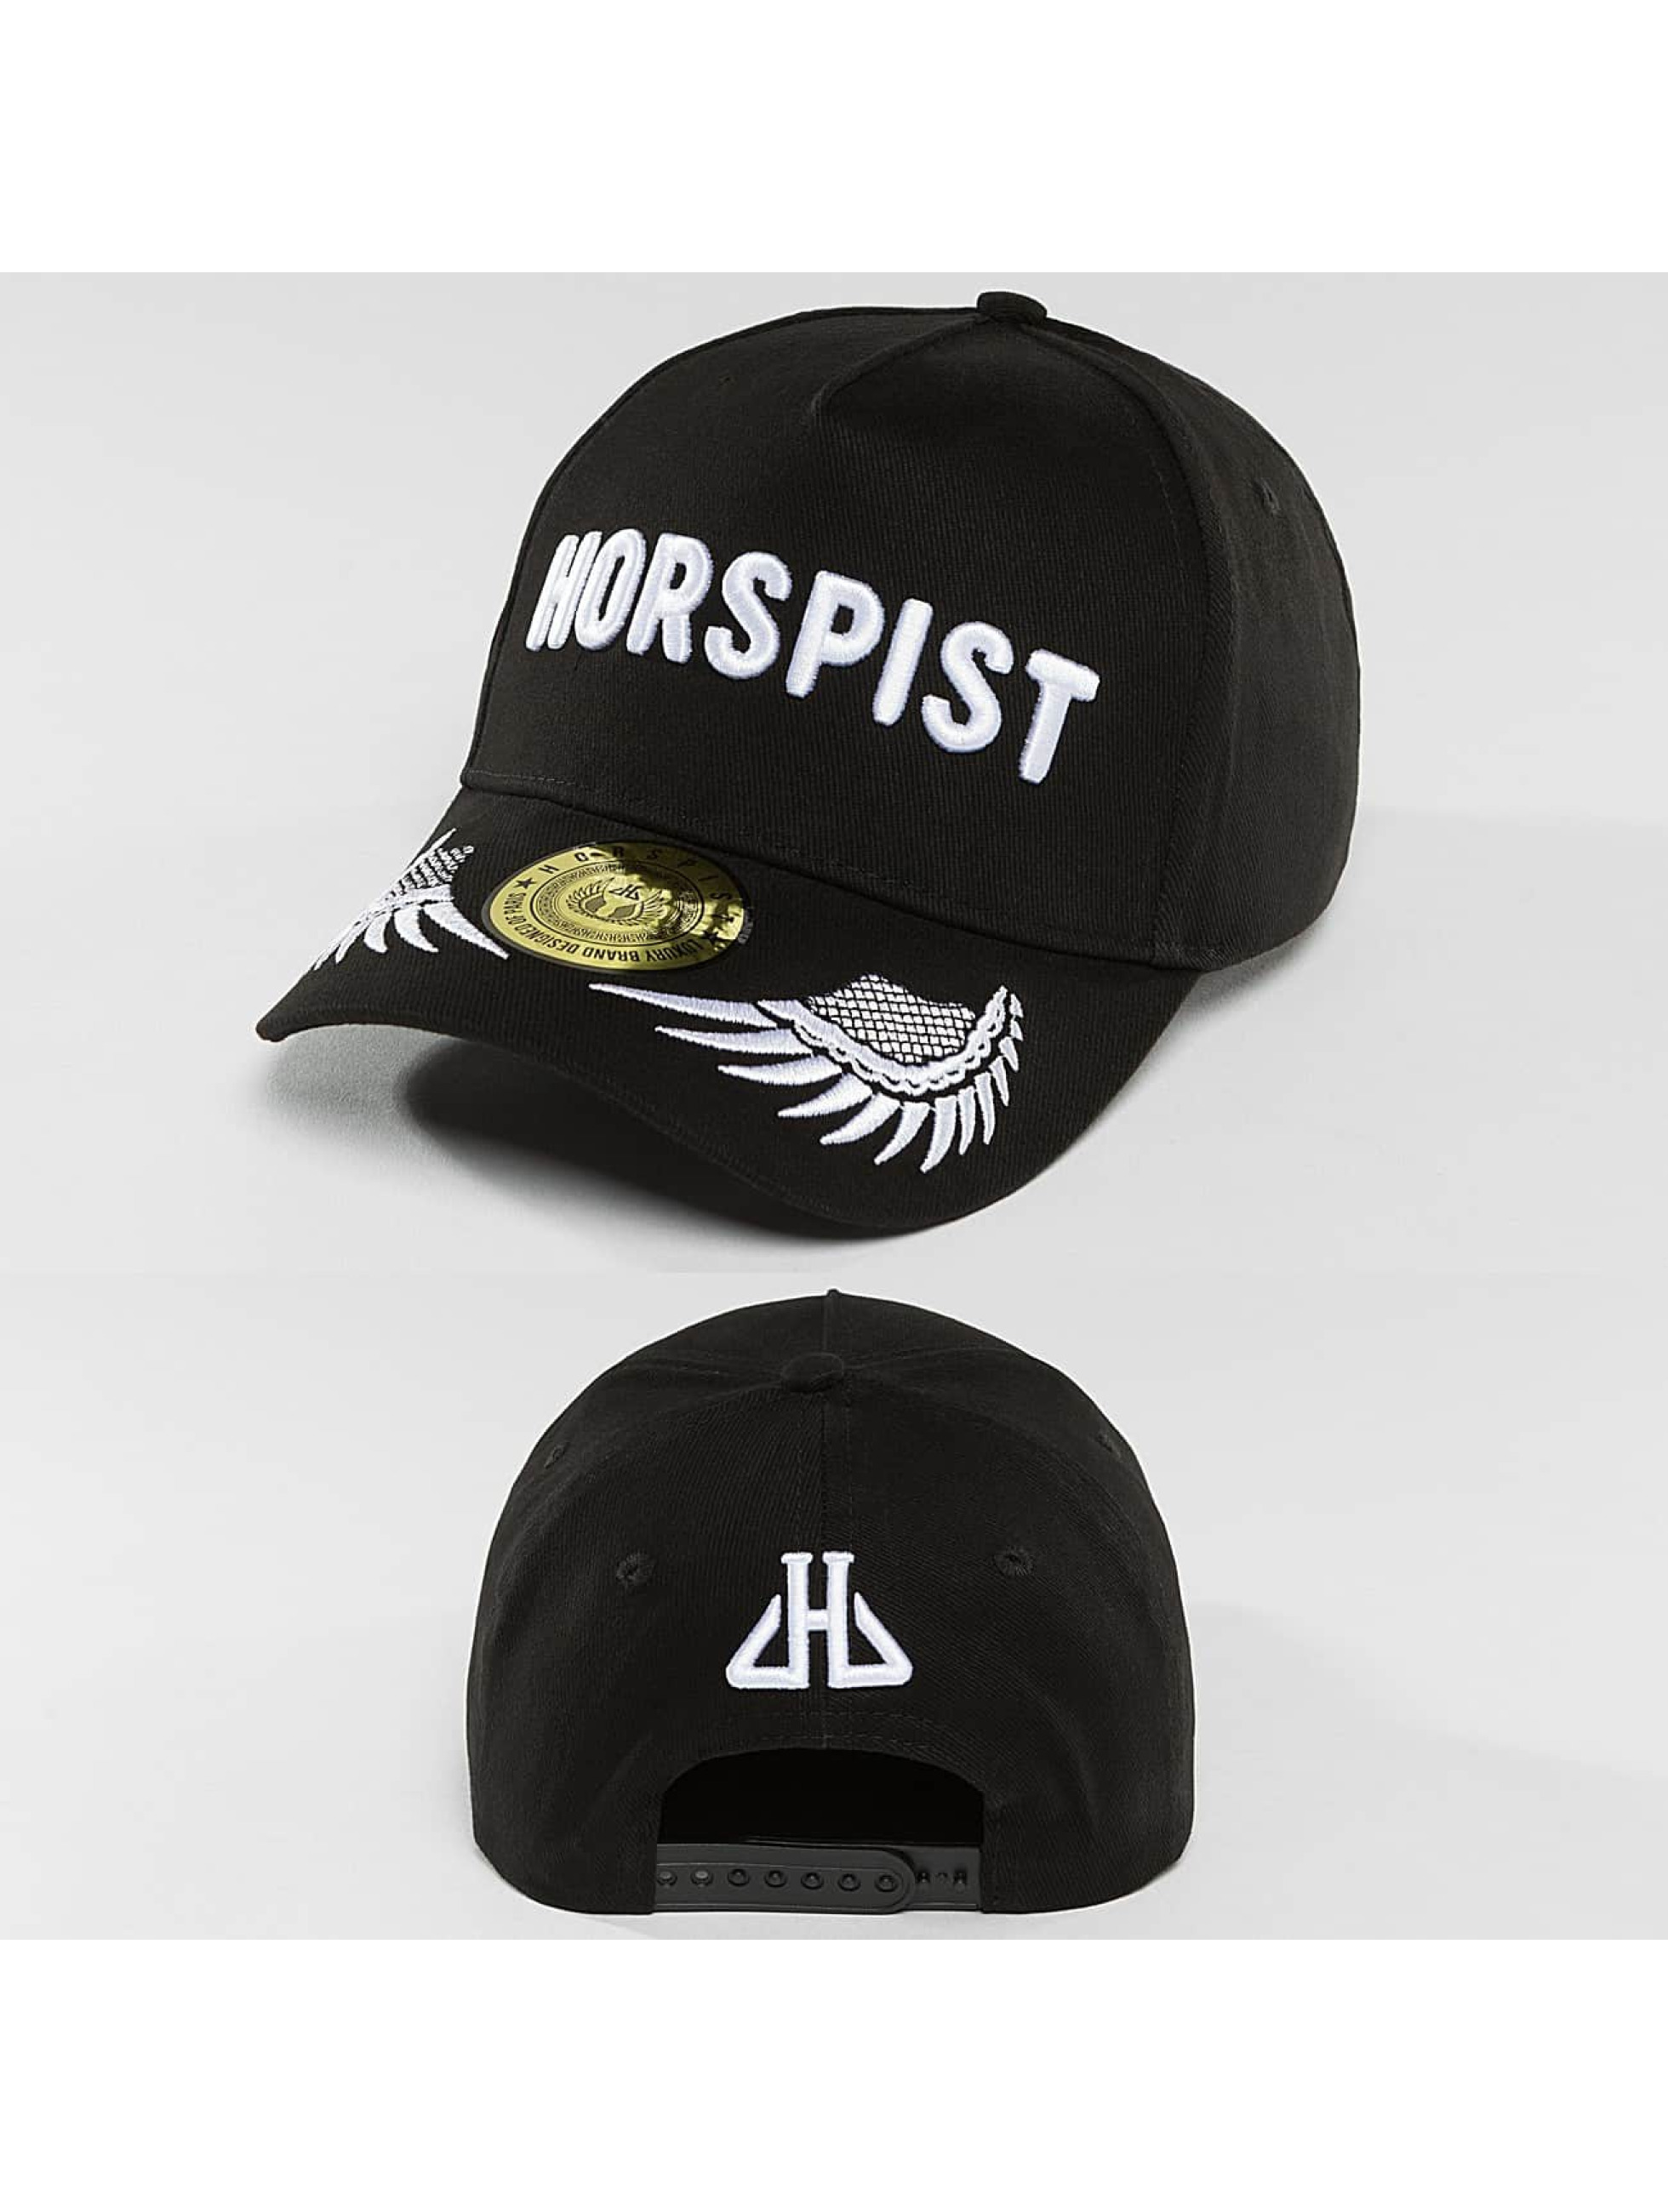 Horspist Snapback Caps Remenber czarny